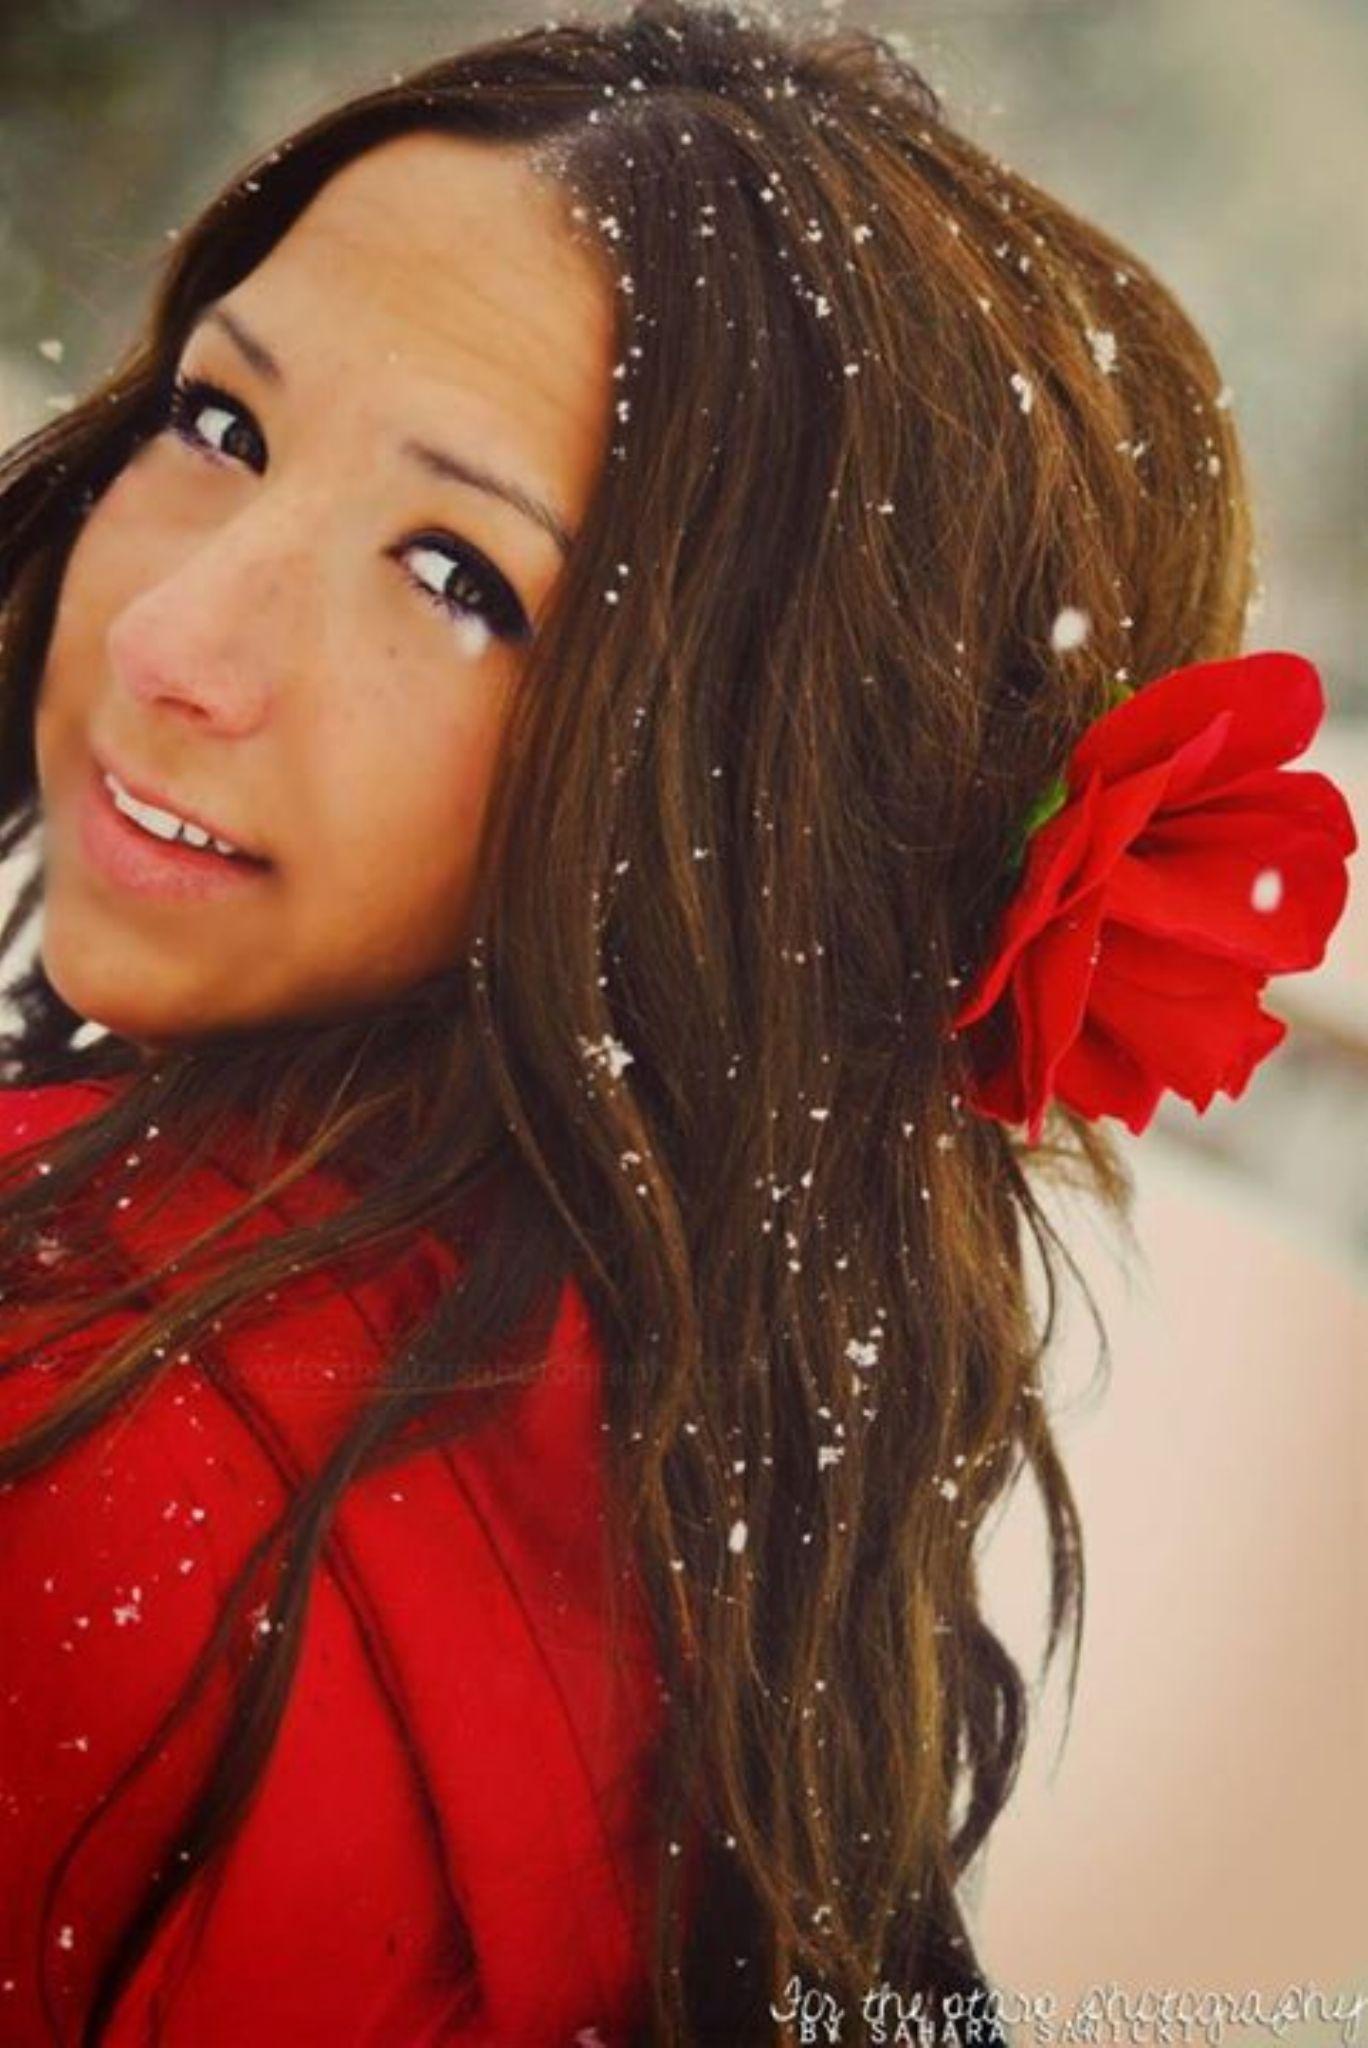 Be My Valentine by FortheStarsPhotography.com